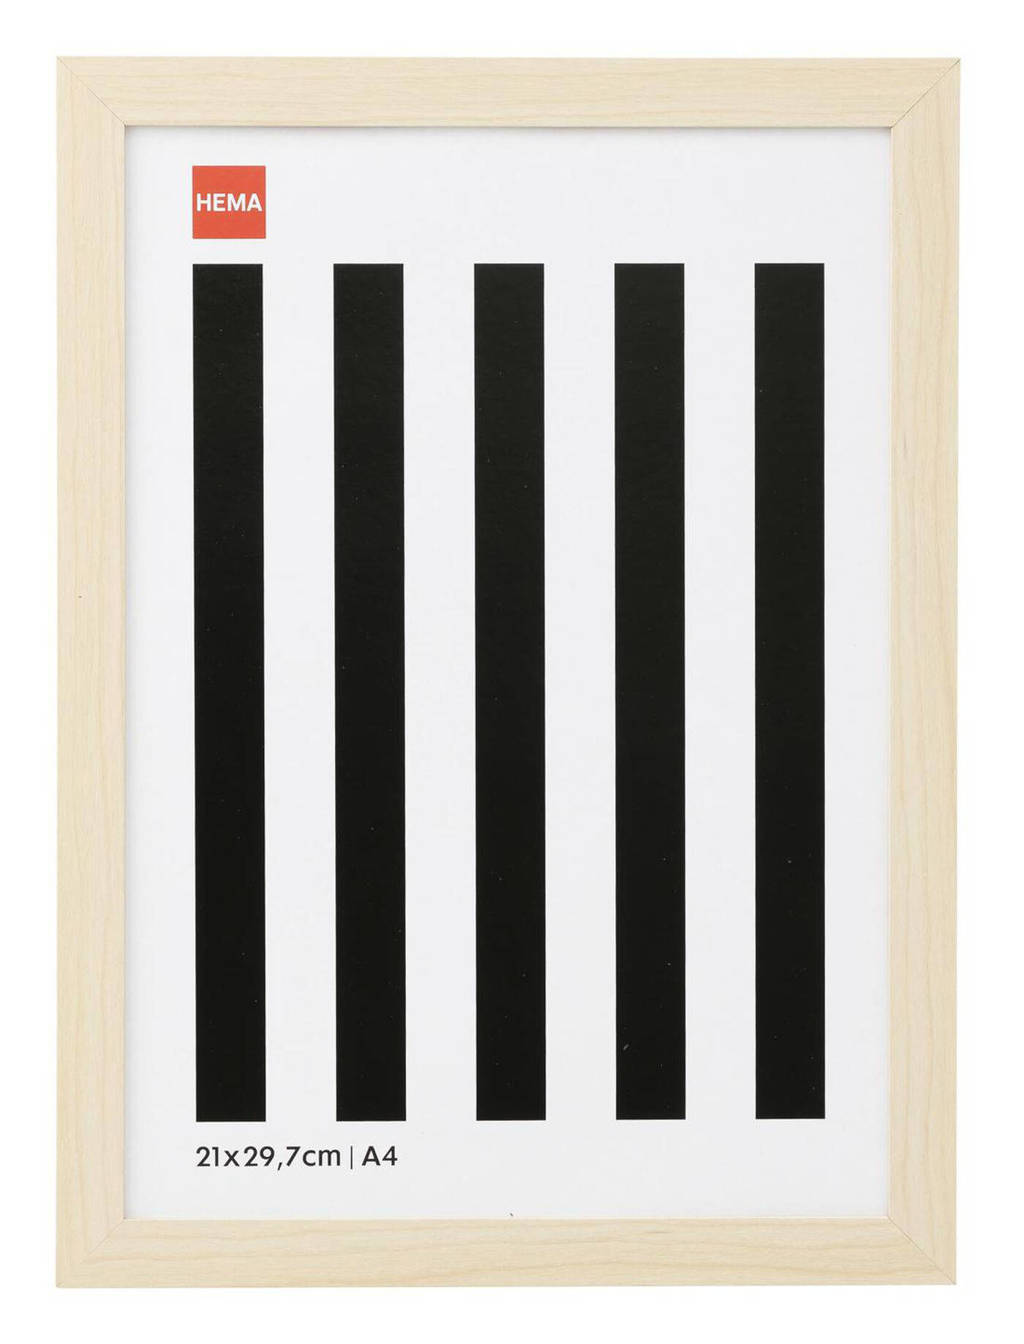 HEMA fotolijst A4  (24x32,5 cm), Bruin